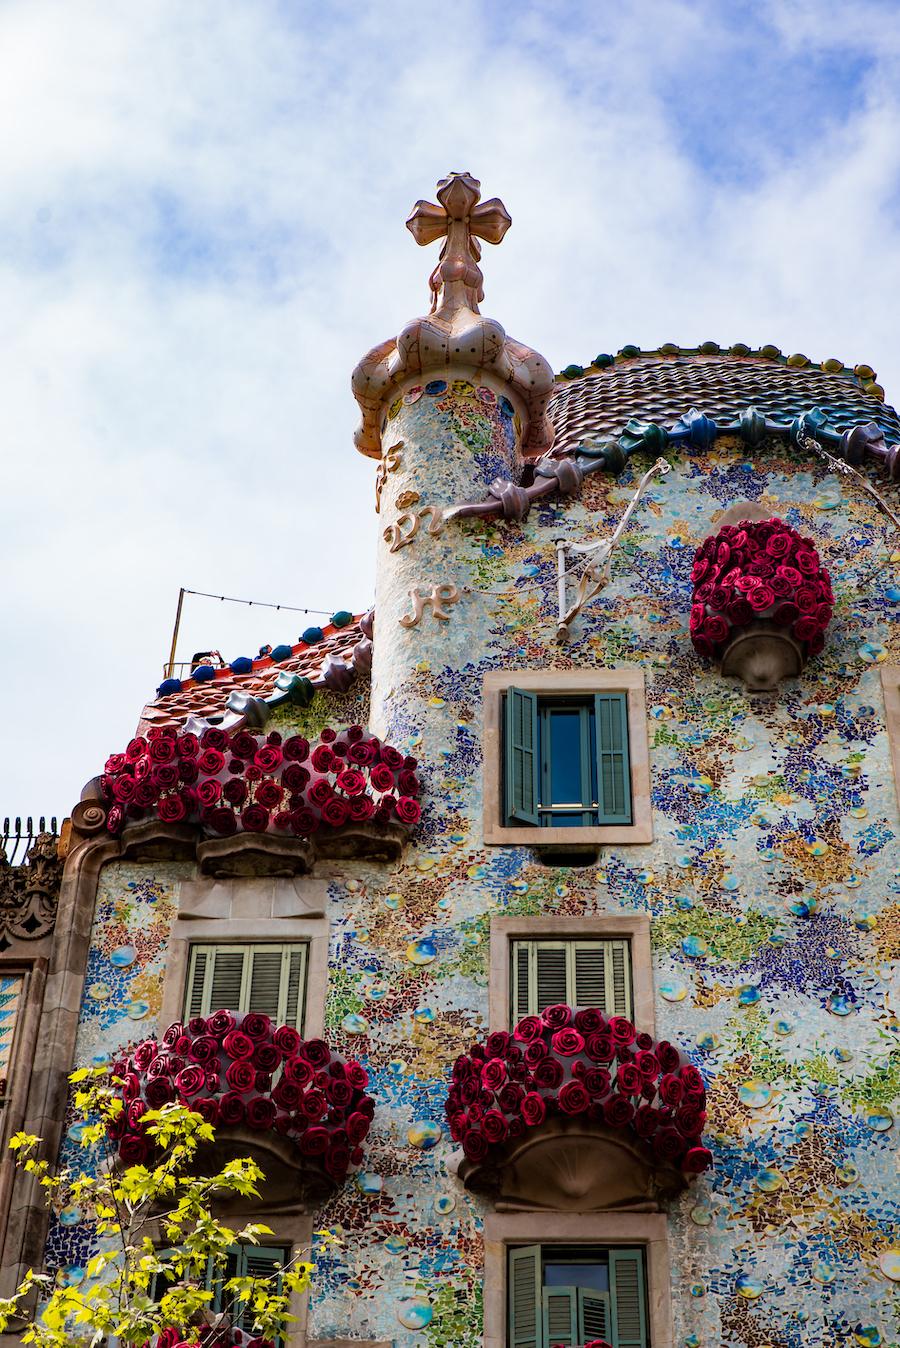 Casa Batllo Sant Jordi Day Barcelona ~ By Ben Holbrook from DriftwoodJournals.com10